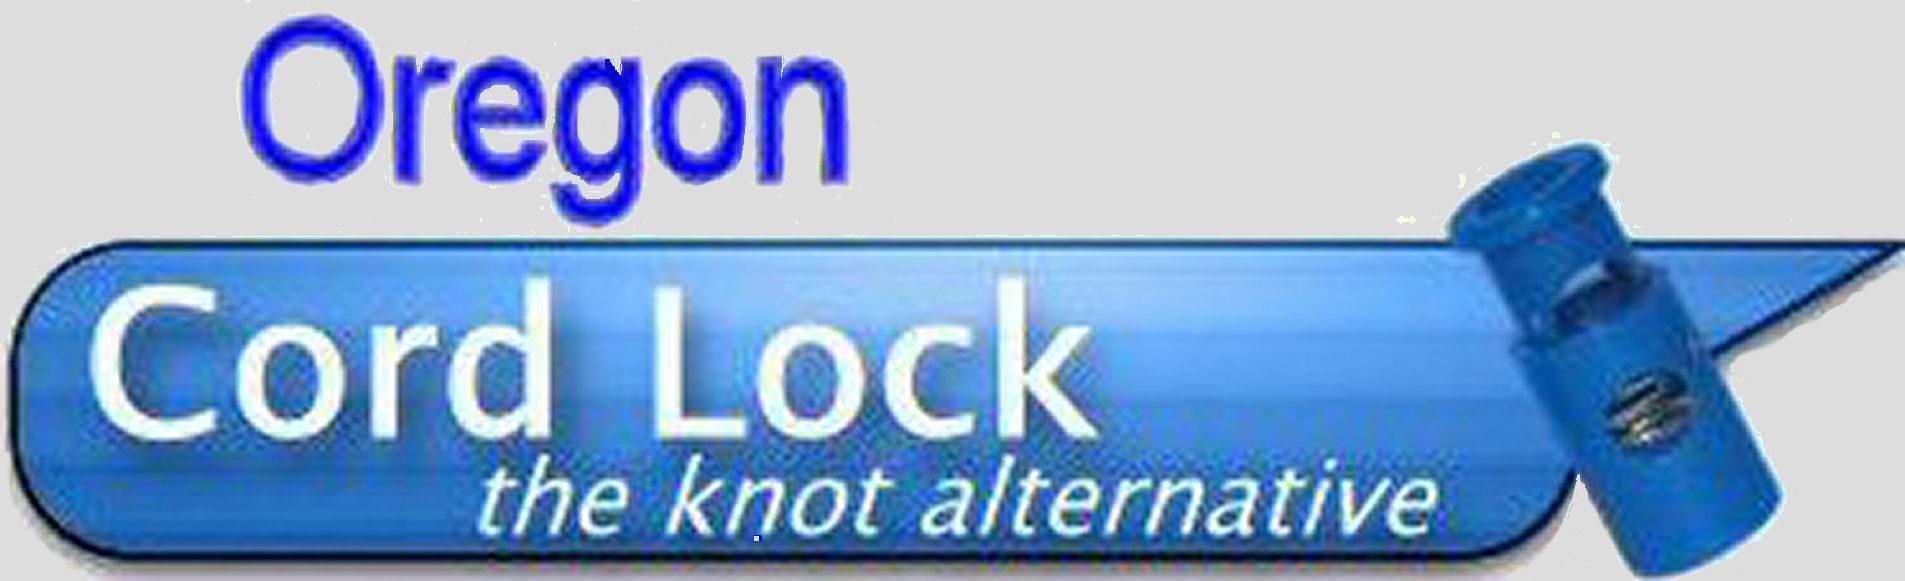 Oregon Cord Lock –  Cord Locks and Handi-bobs